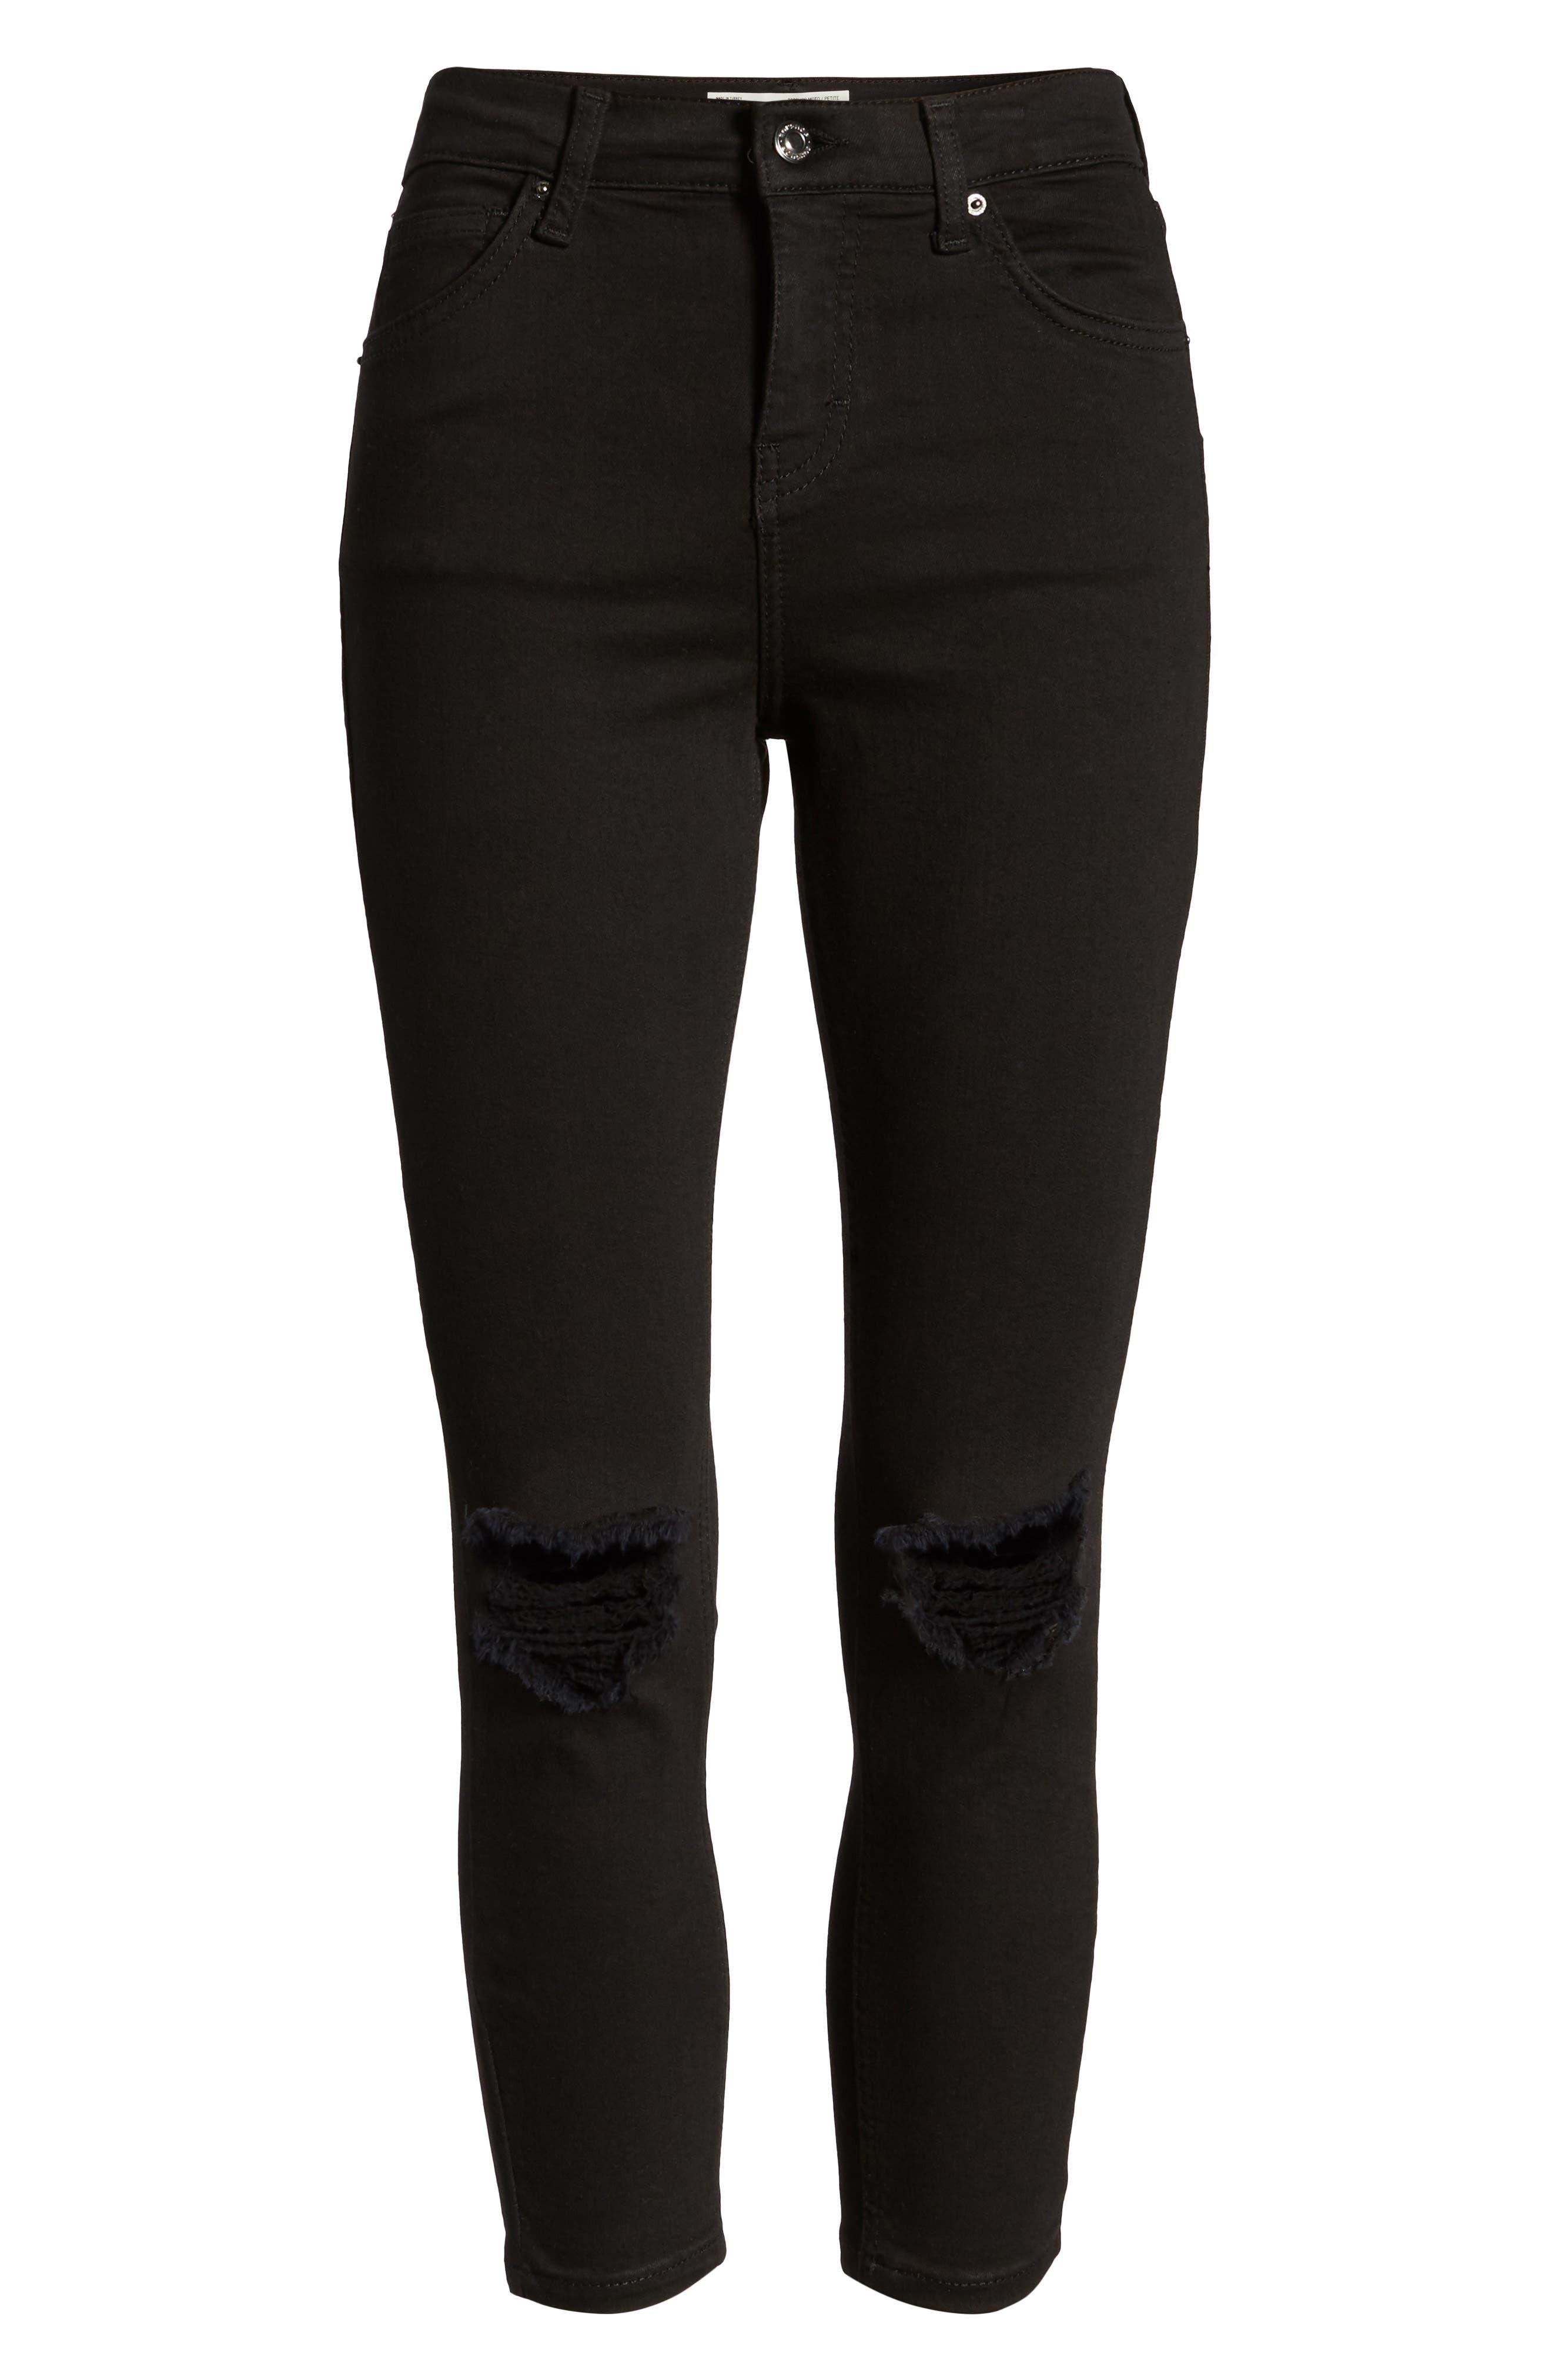 Jamie Ripped Jeans,                             Alternate thumbnail 7, color,                             Black